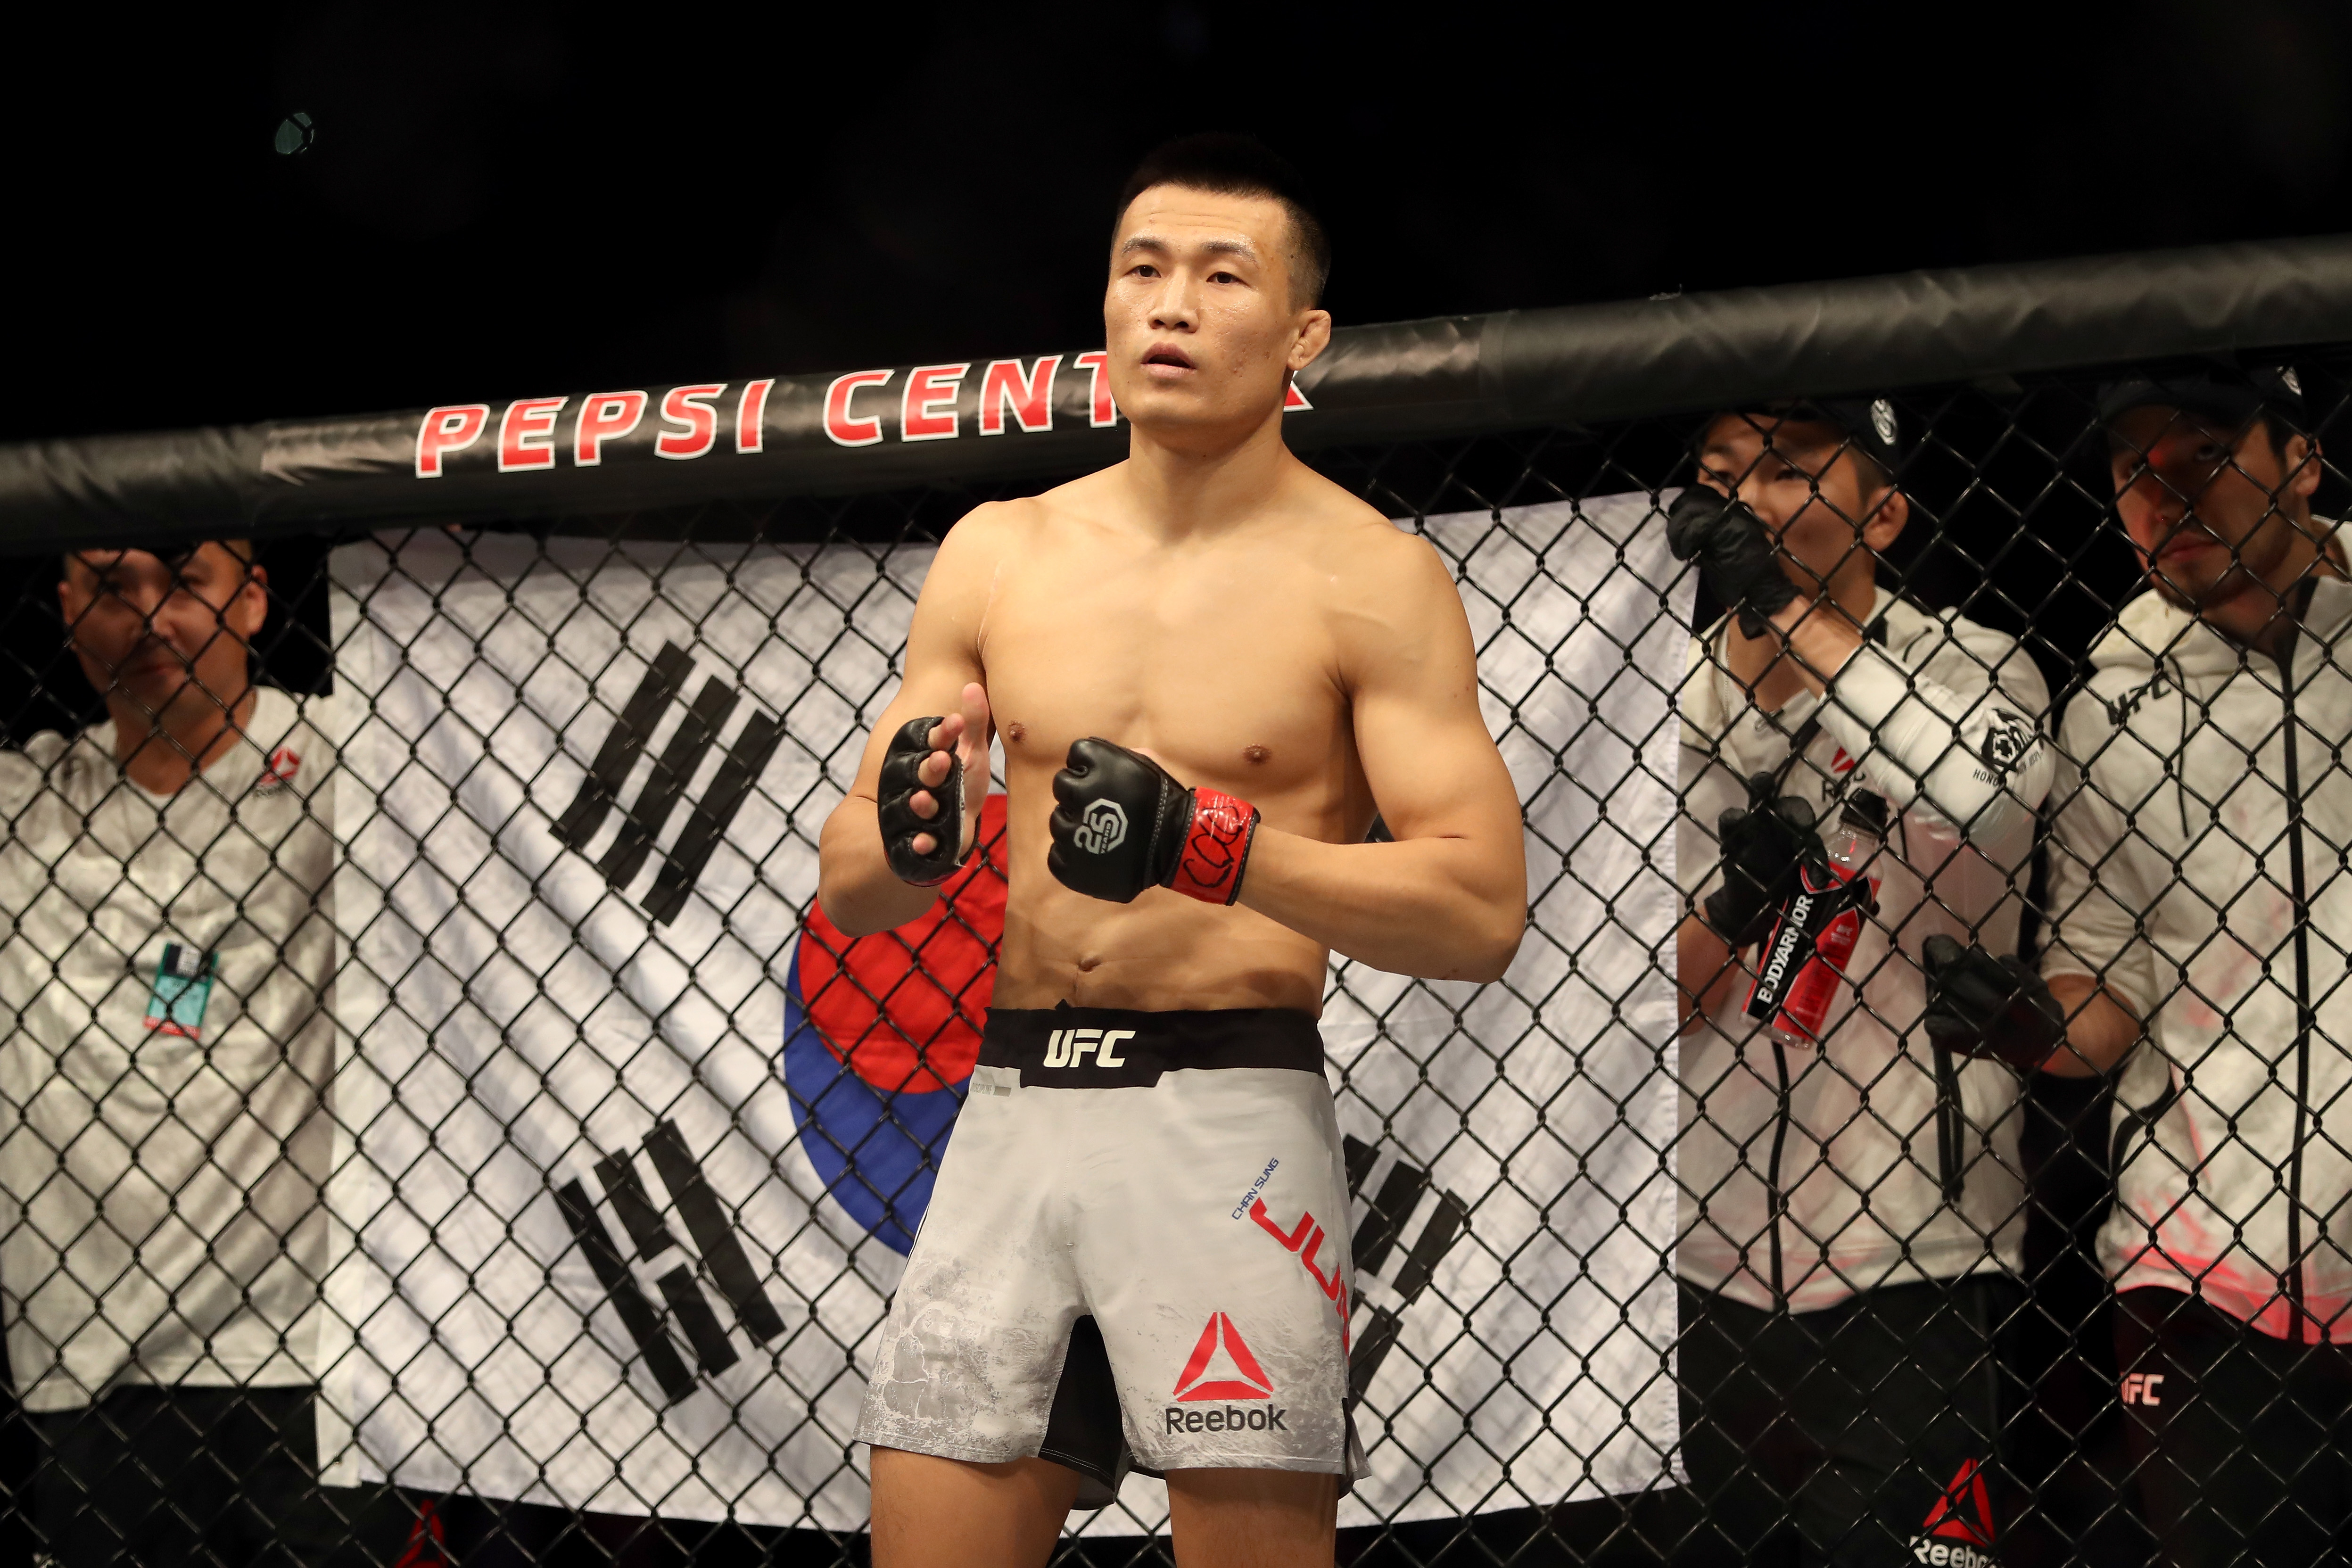 UFC Fight Night The Korean Zombie v Rodriguez